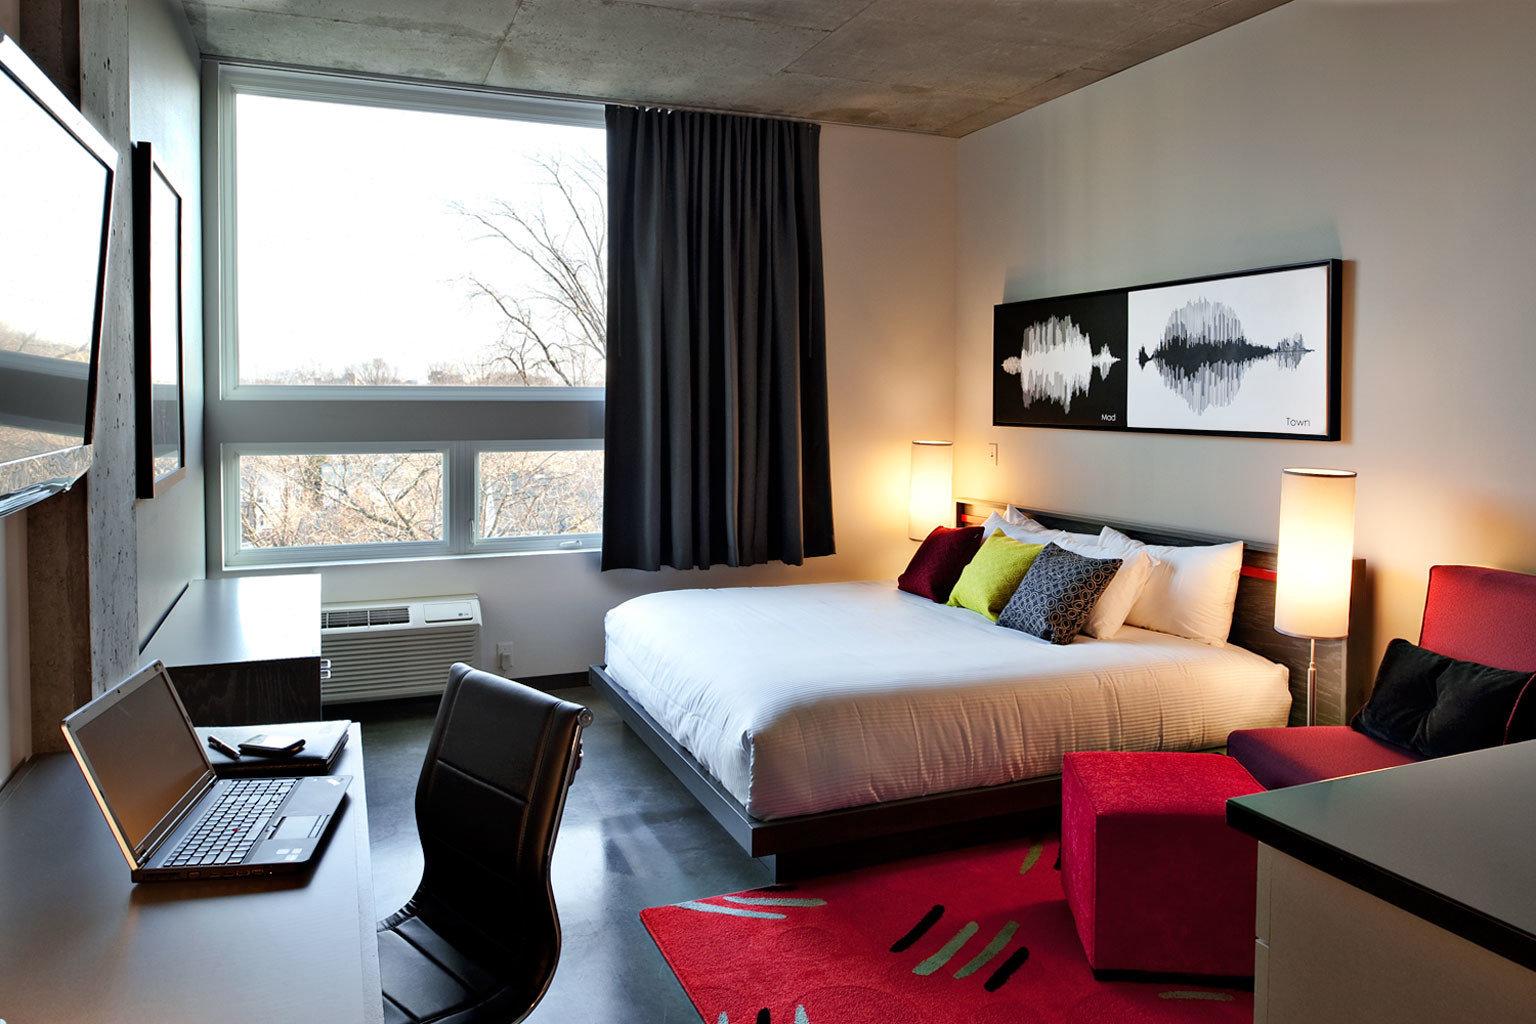 Bedroom Resort sofa property Suite living room cottage condominium Villa Modern flat